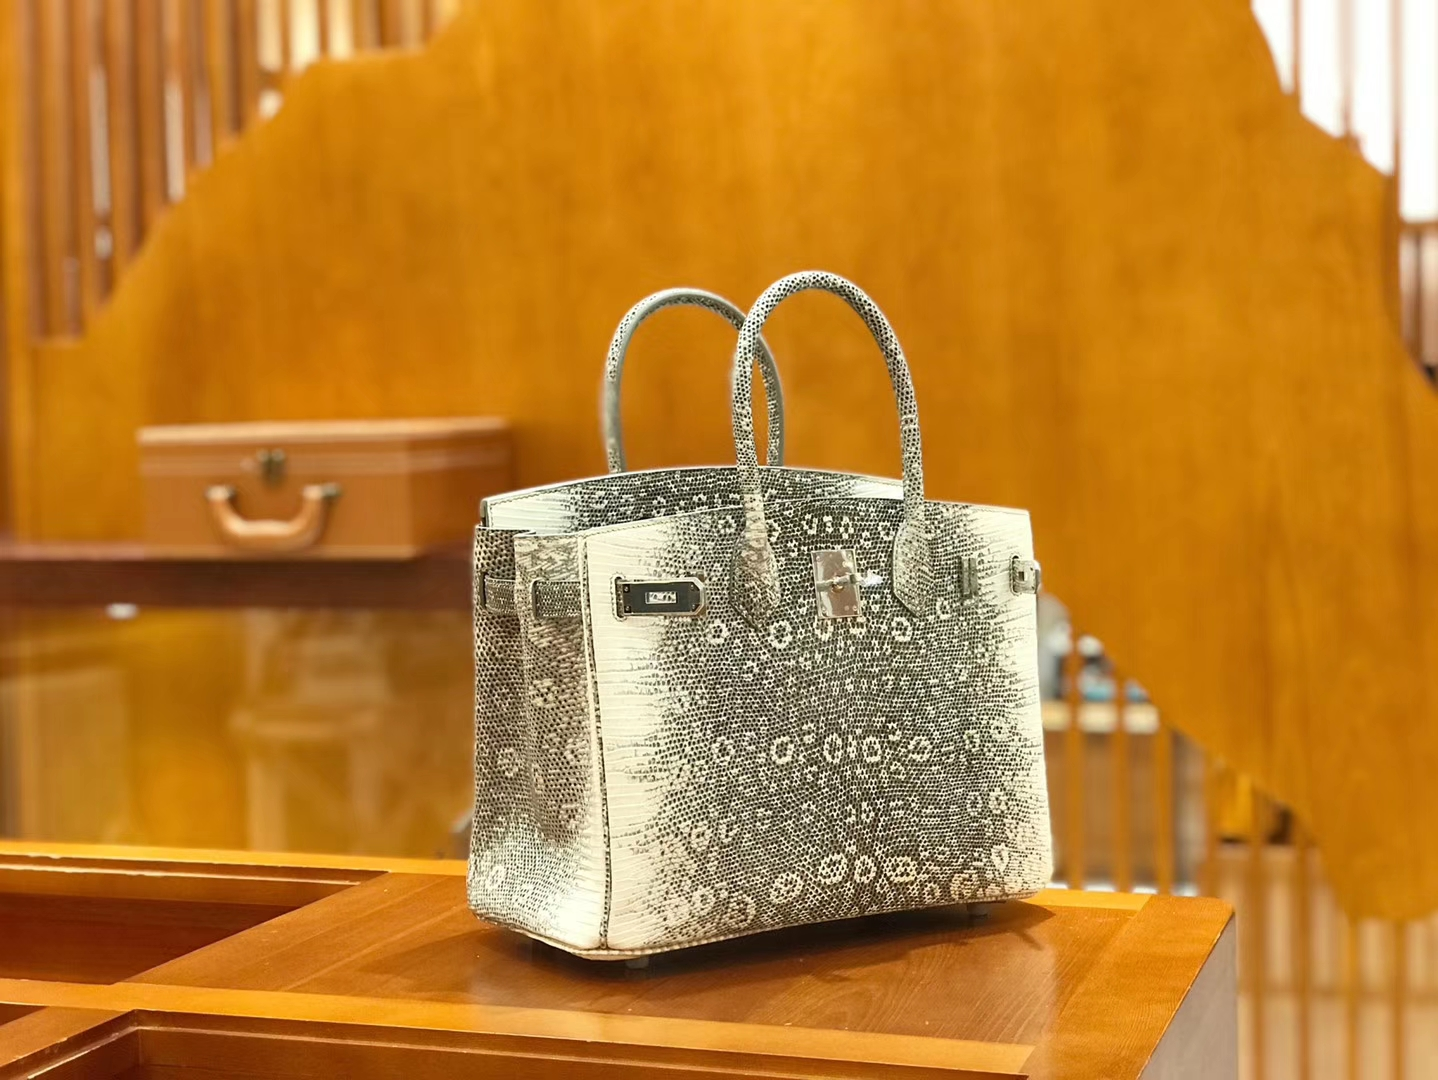 Hermès(爱马仕)Birkin 30cm 蜥蜴皮 原色 顶级版本 高订现货